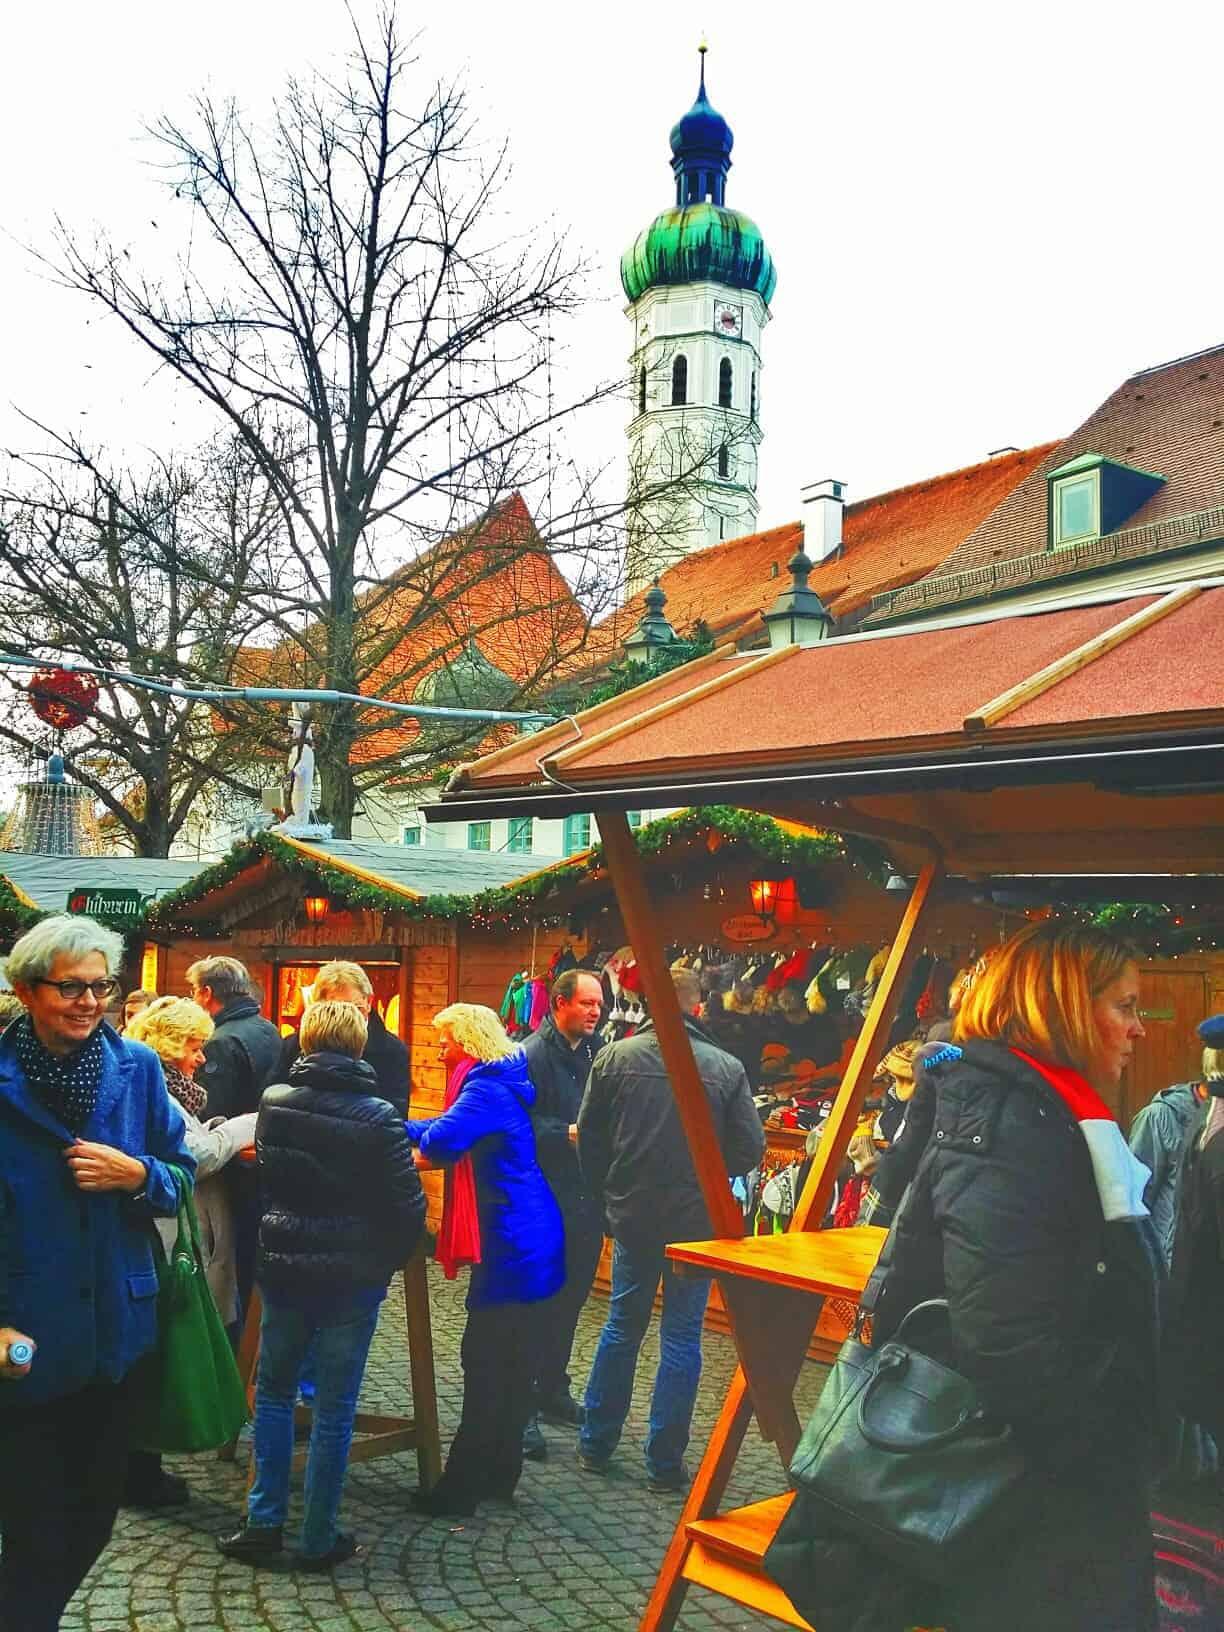 Dachau Christmas Market